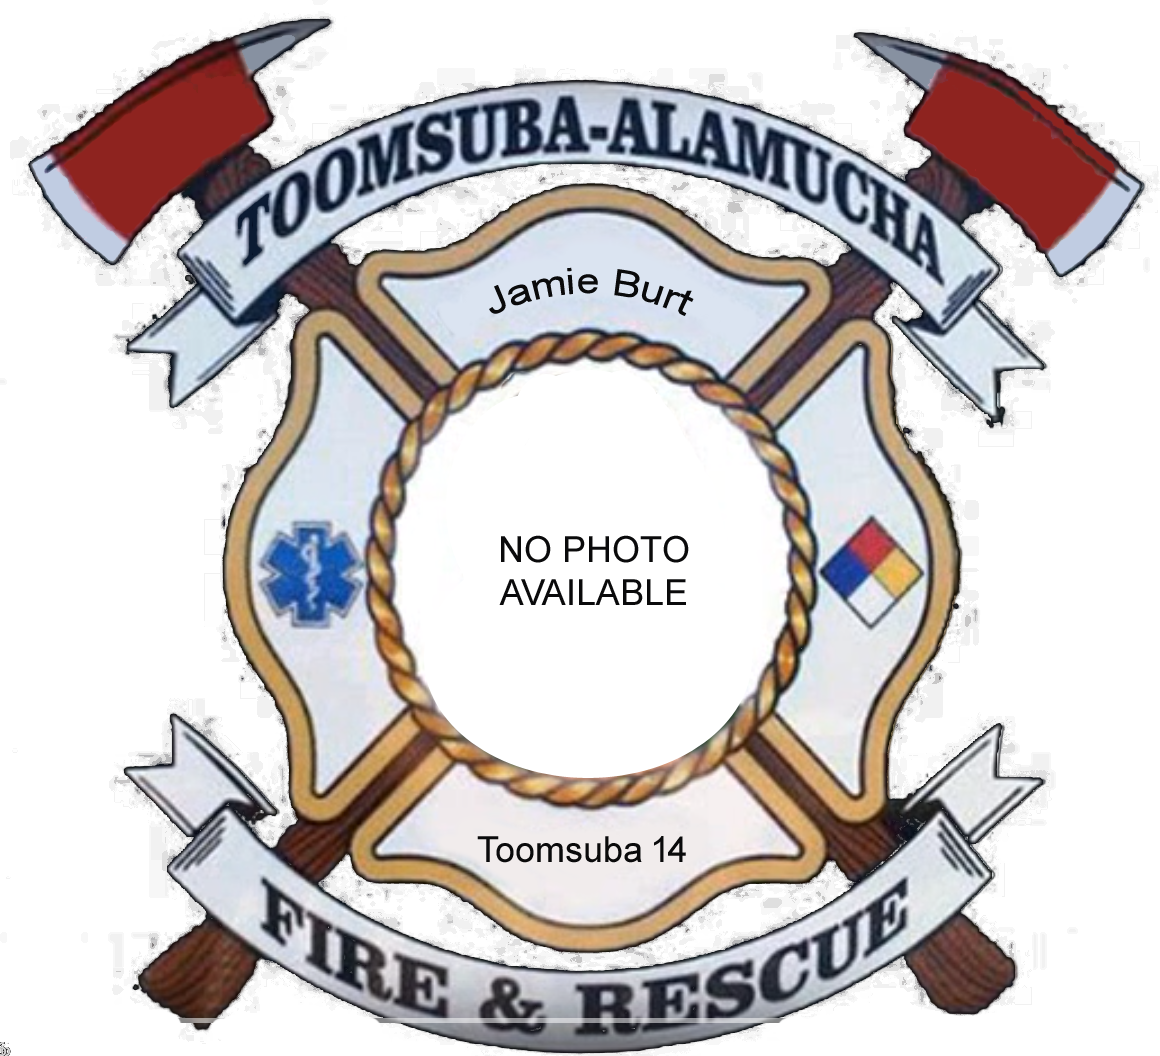 Jamie Burt; Toomsuba Firefighter #14